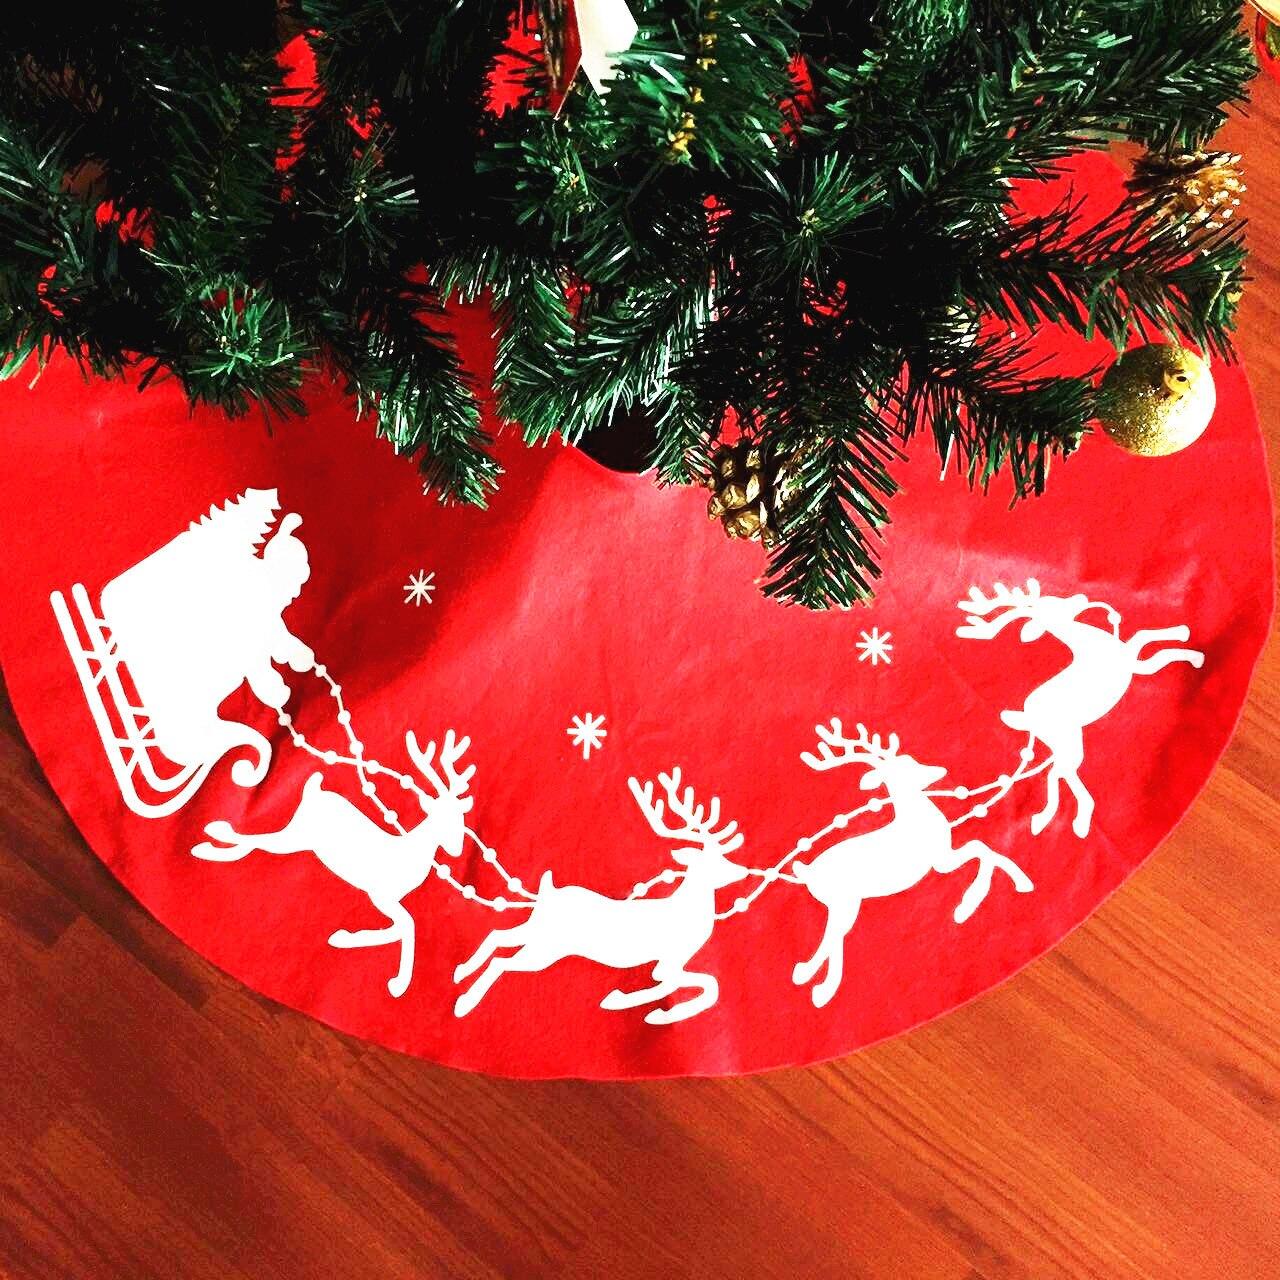 Printed Santa Claus Elk Christmas Tree Skirt Red XMAS Decorations Christmas Tree Dress New Year